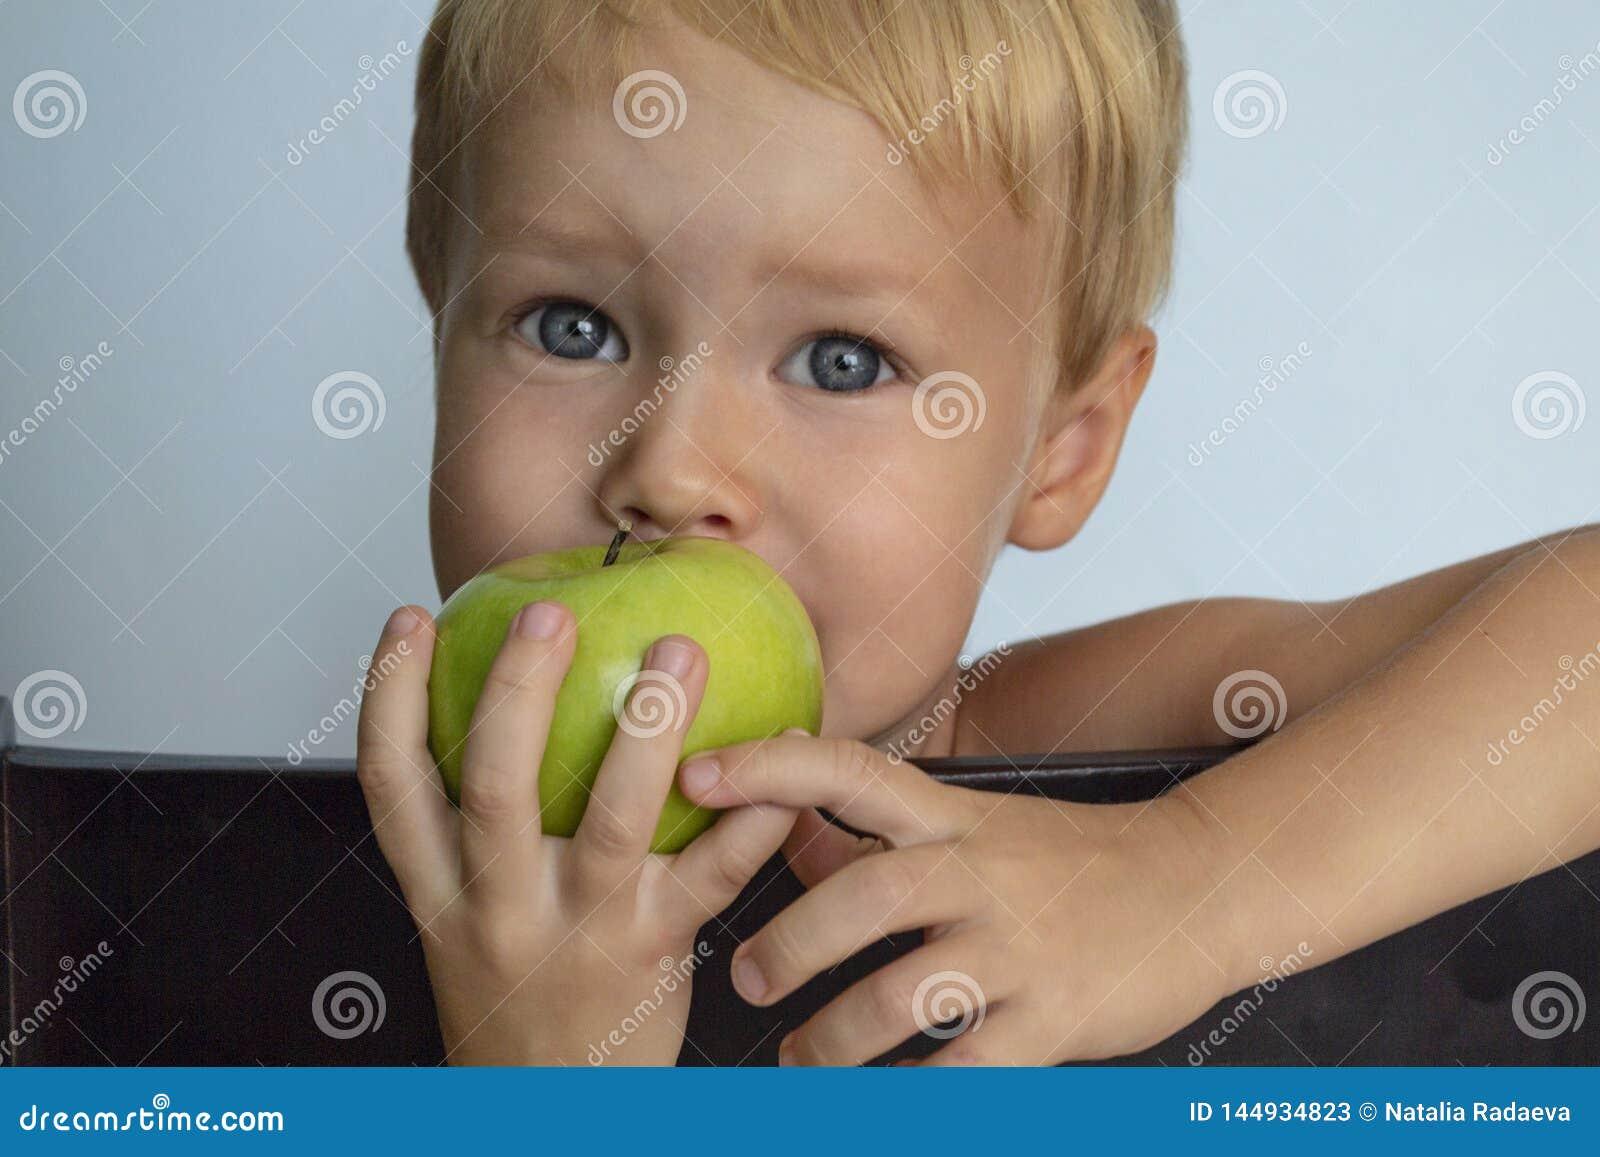 Cute european blond boy eating an green Apple. Healthy food